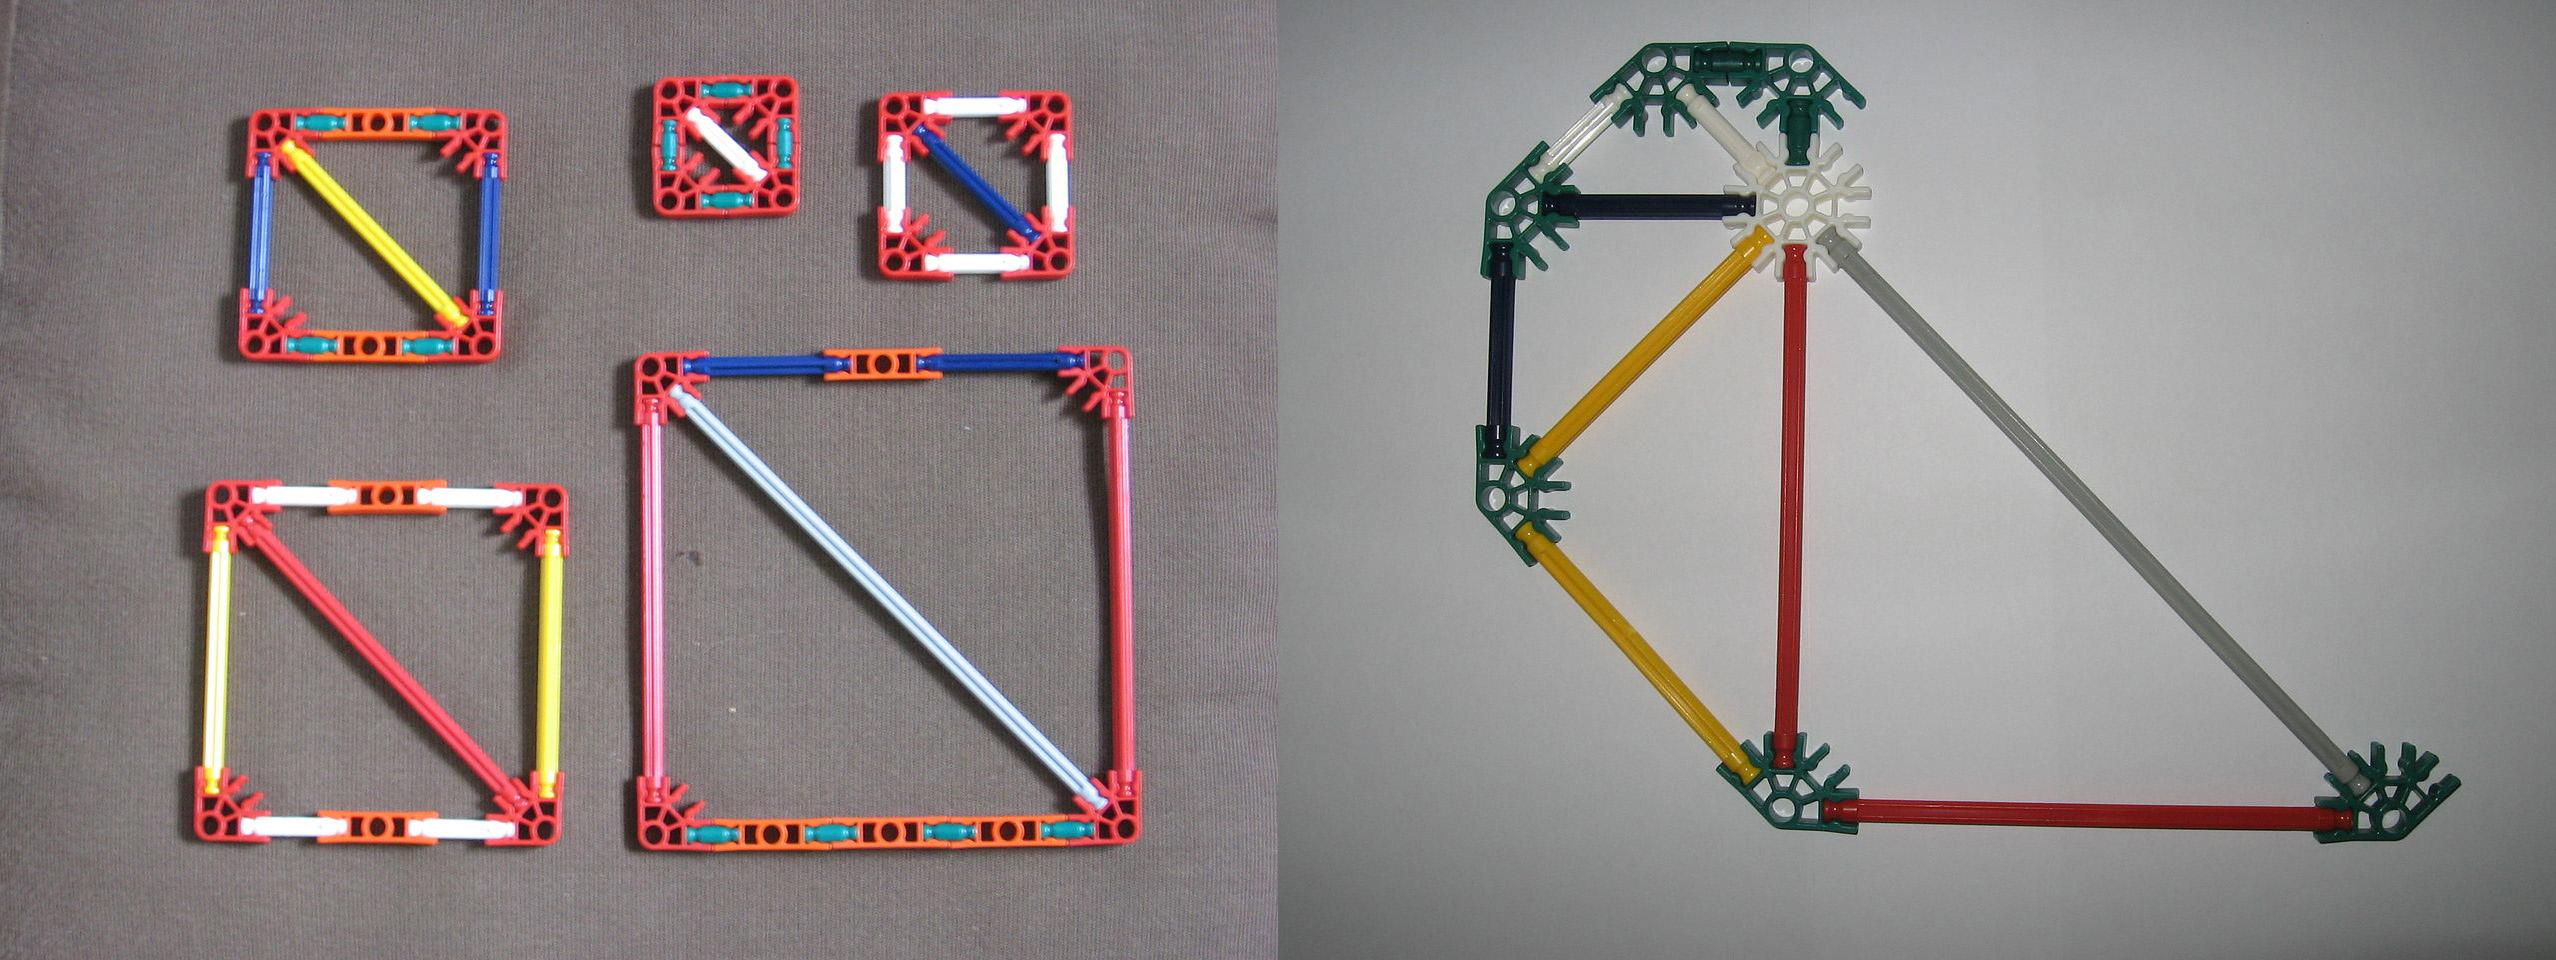 formas juguetes k'net